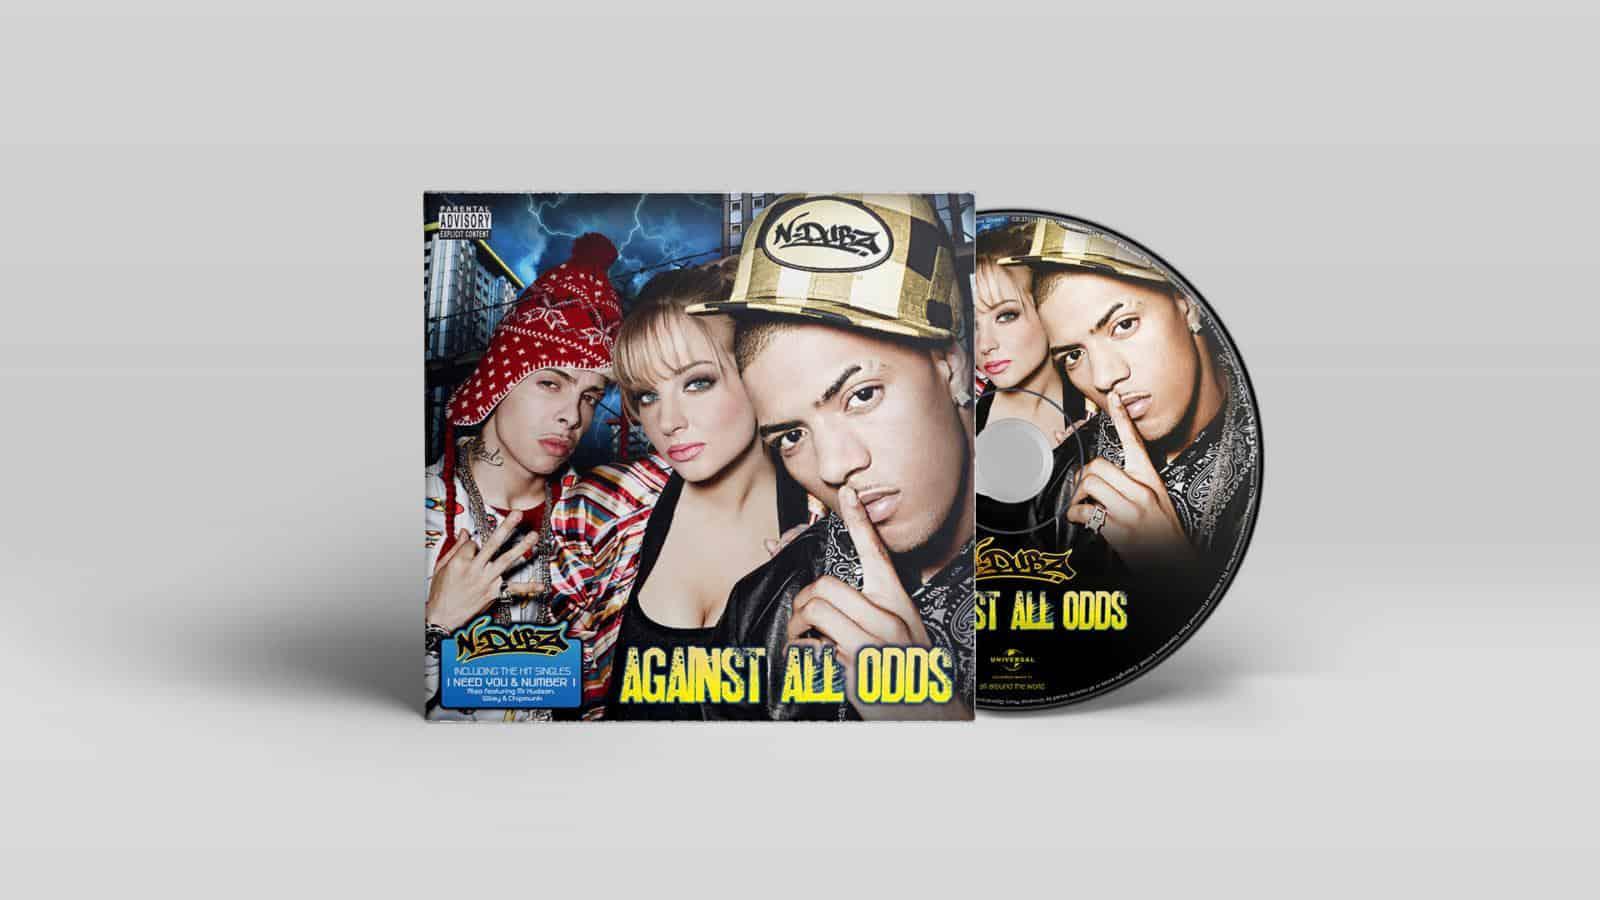 N-Dubz album cover